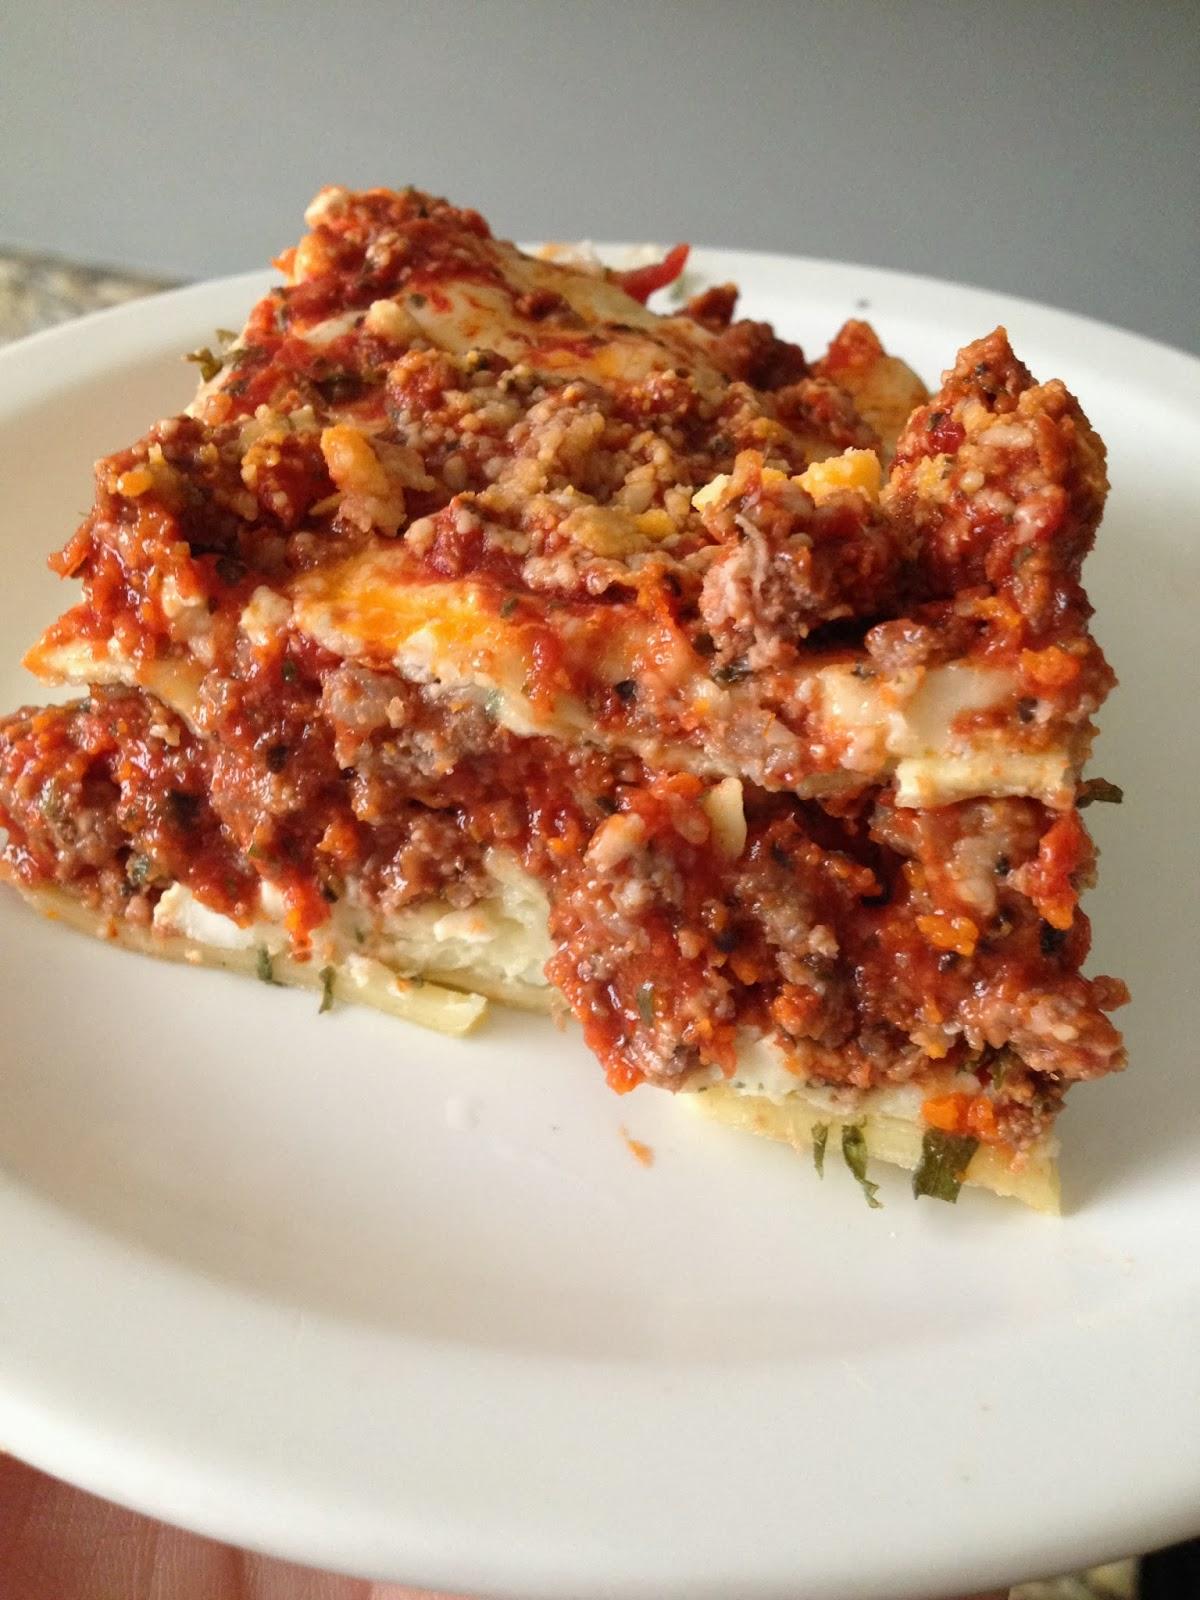 EatYourHeartOut: Pioneer Woman's Lasagna